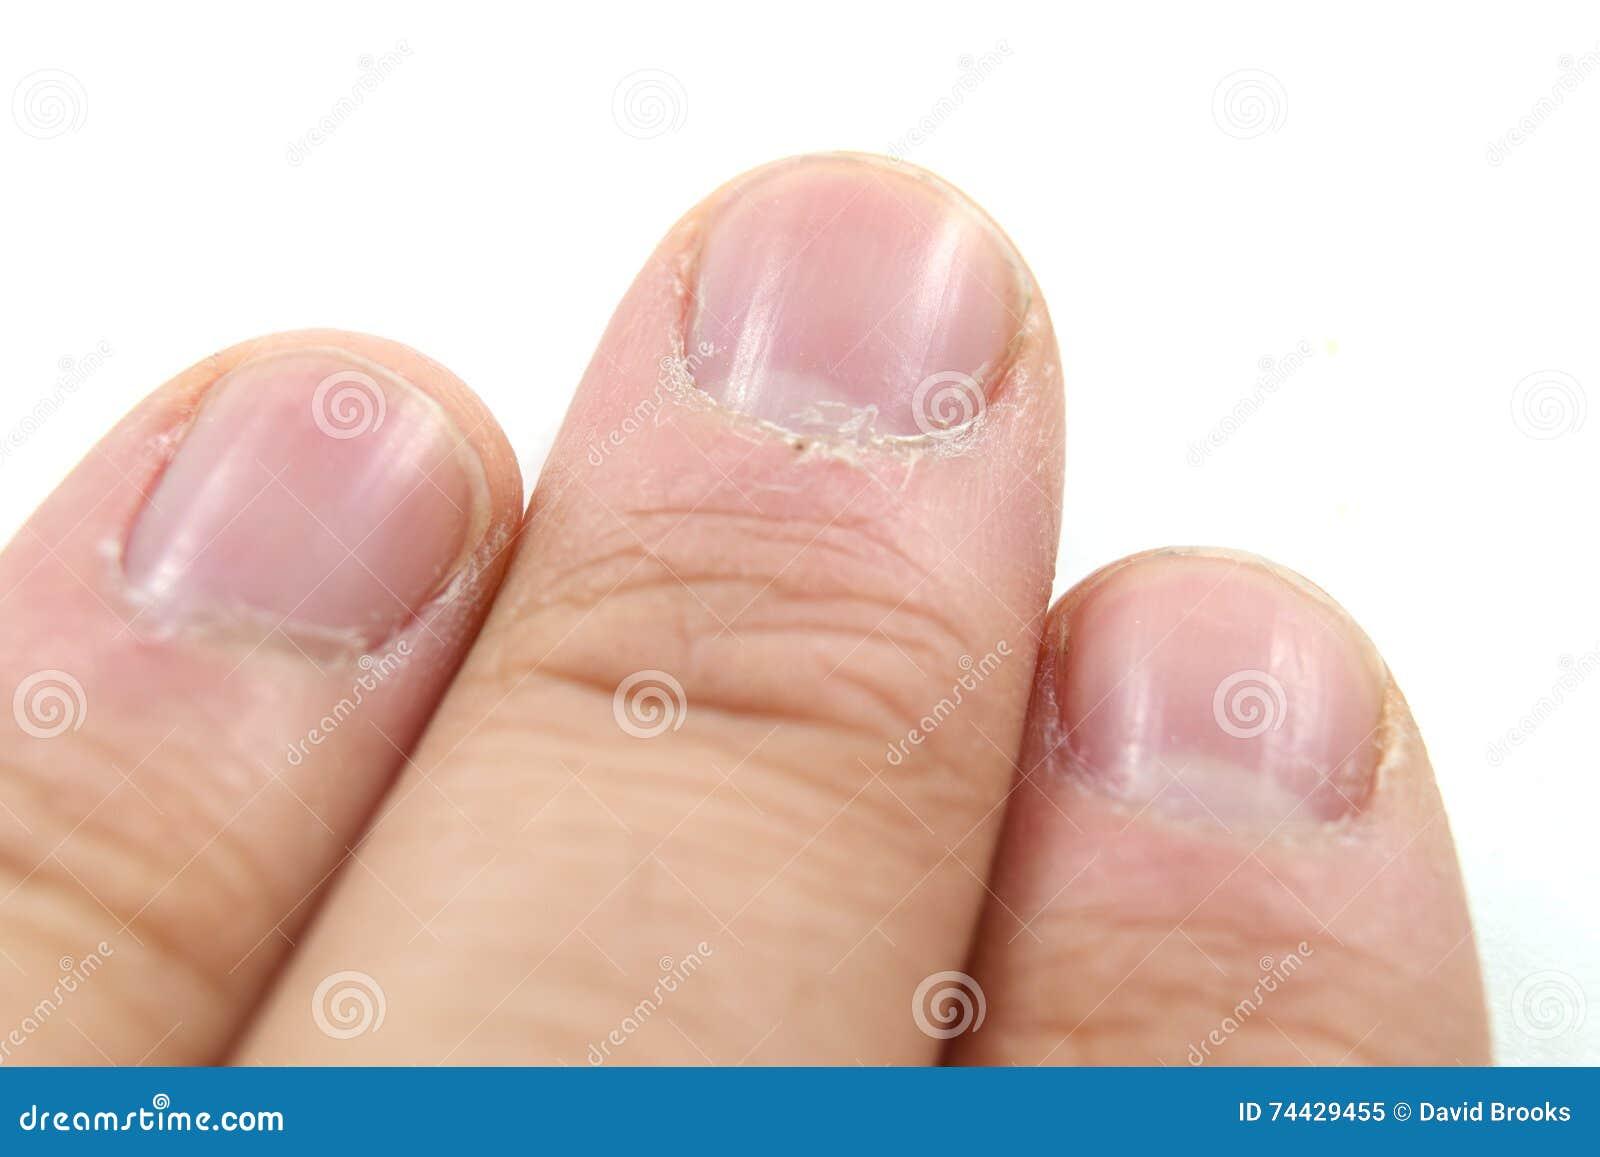 Cuticles macro stock image. Image of nails, isolated - 74429455